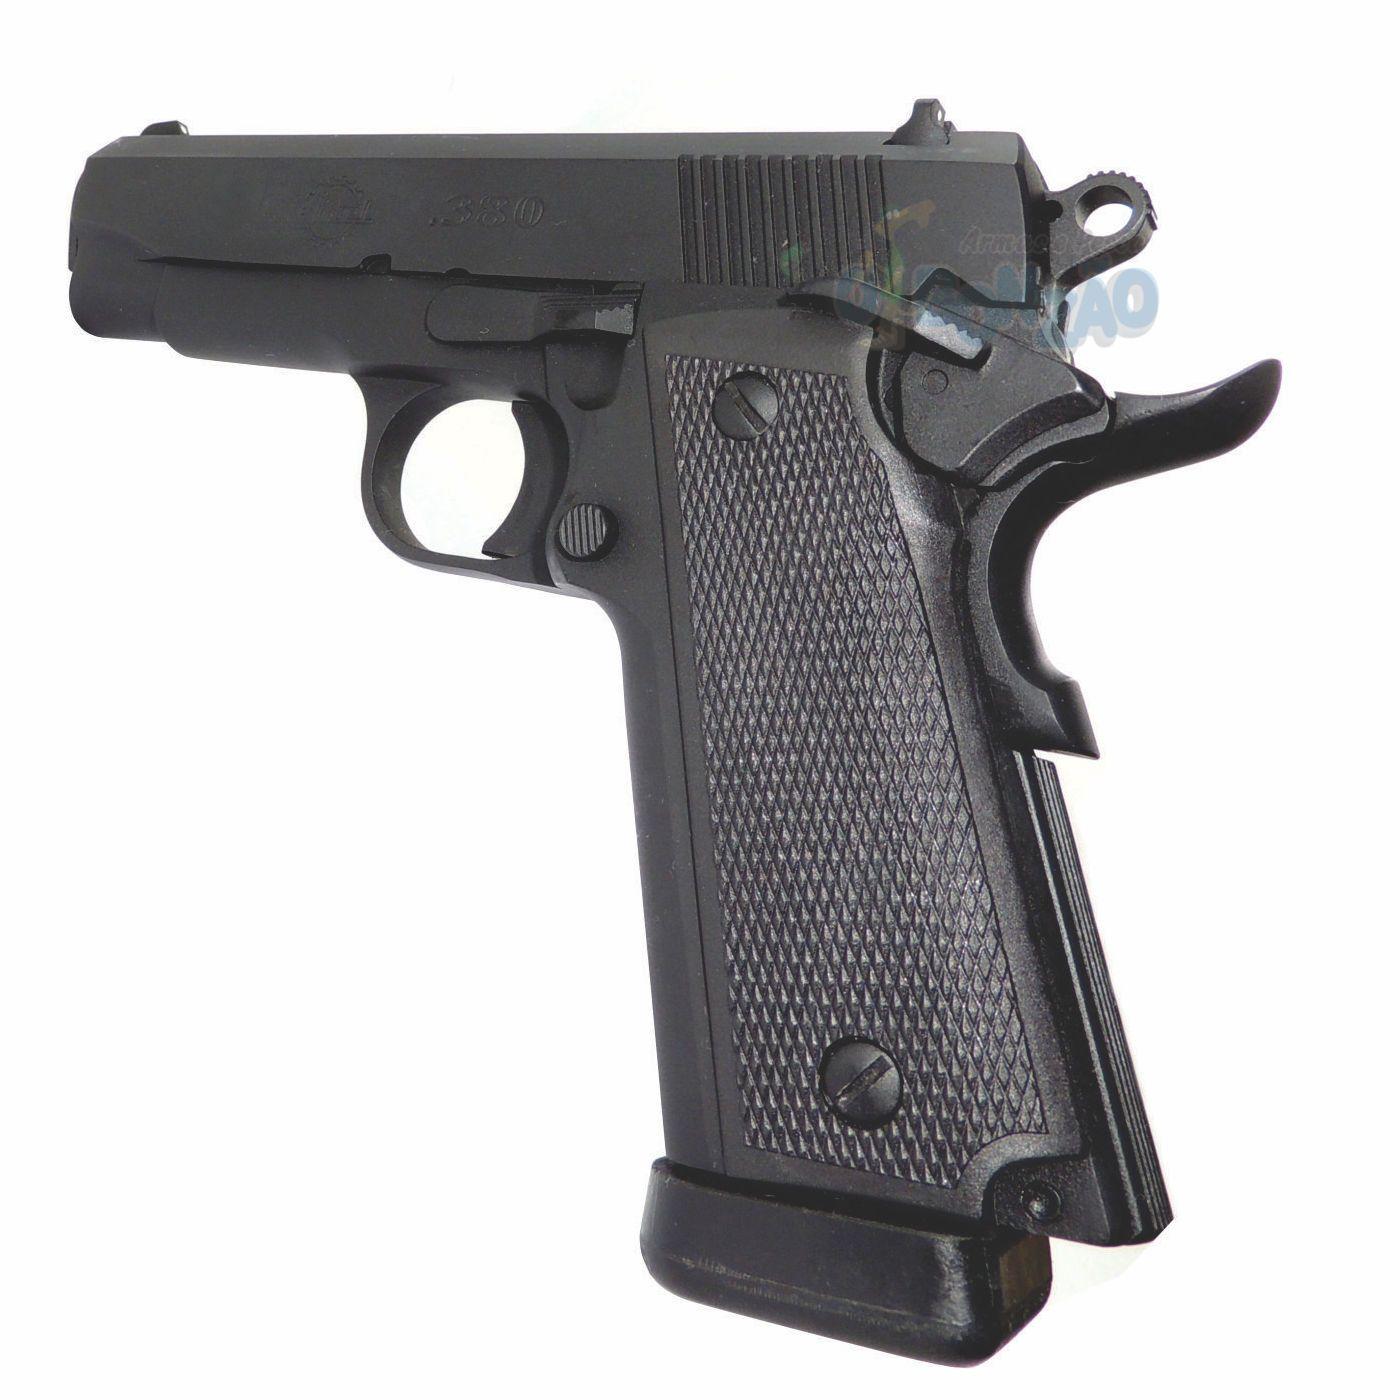 Pistola Imbel MD1N ADC Cal .380 ACP 9+1 Tiros Oxidada